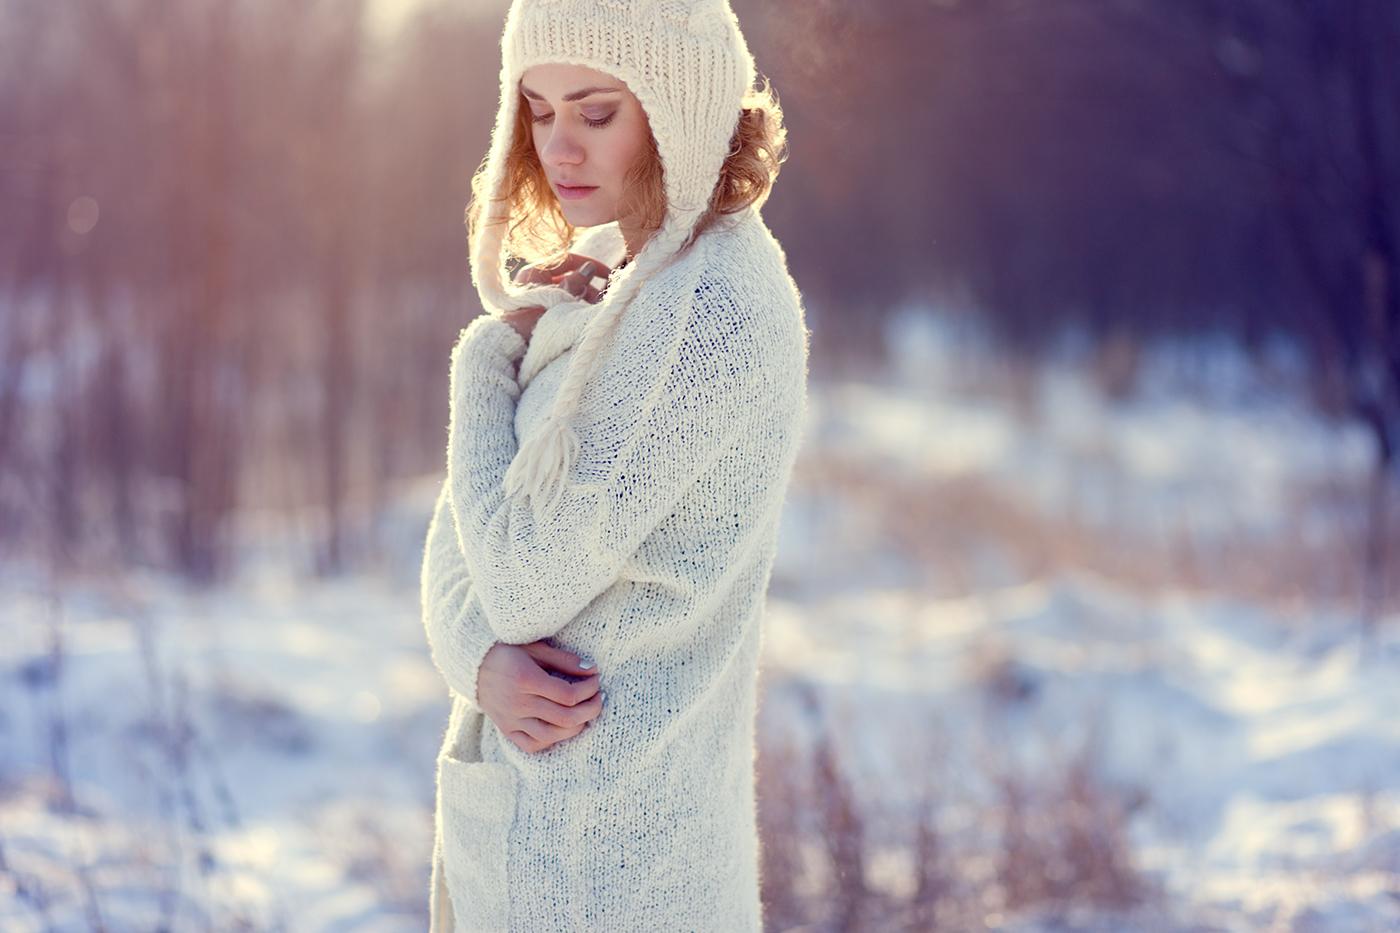 Adobe Portfolio model outdoors winter